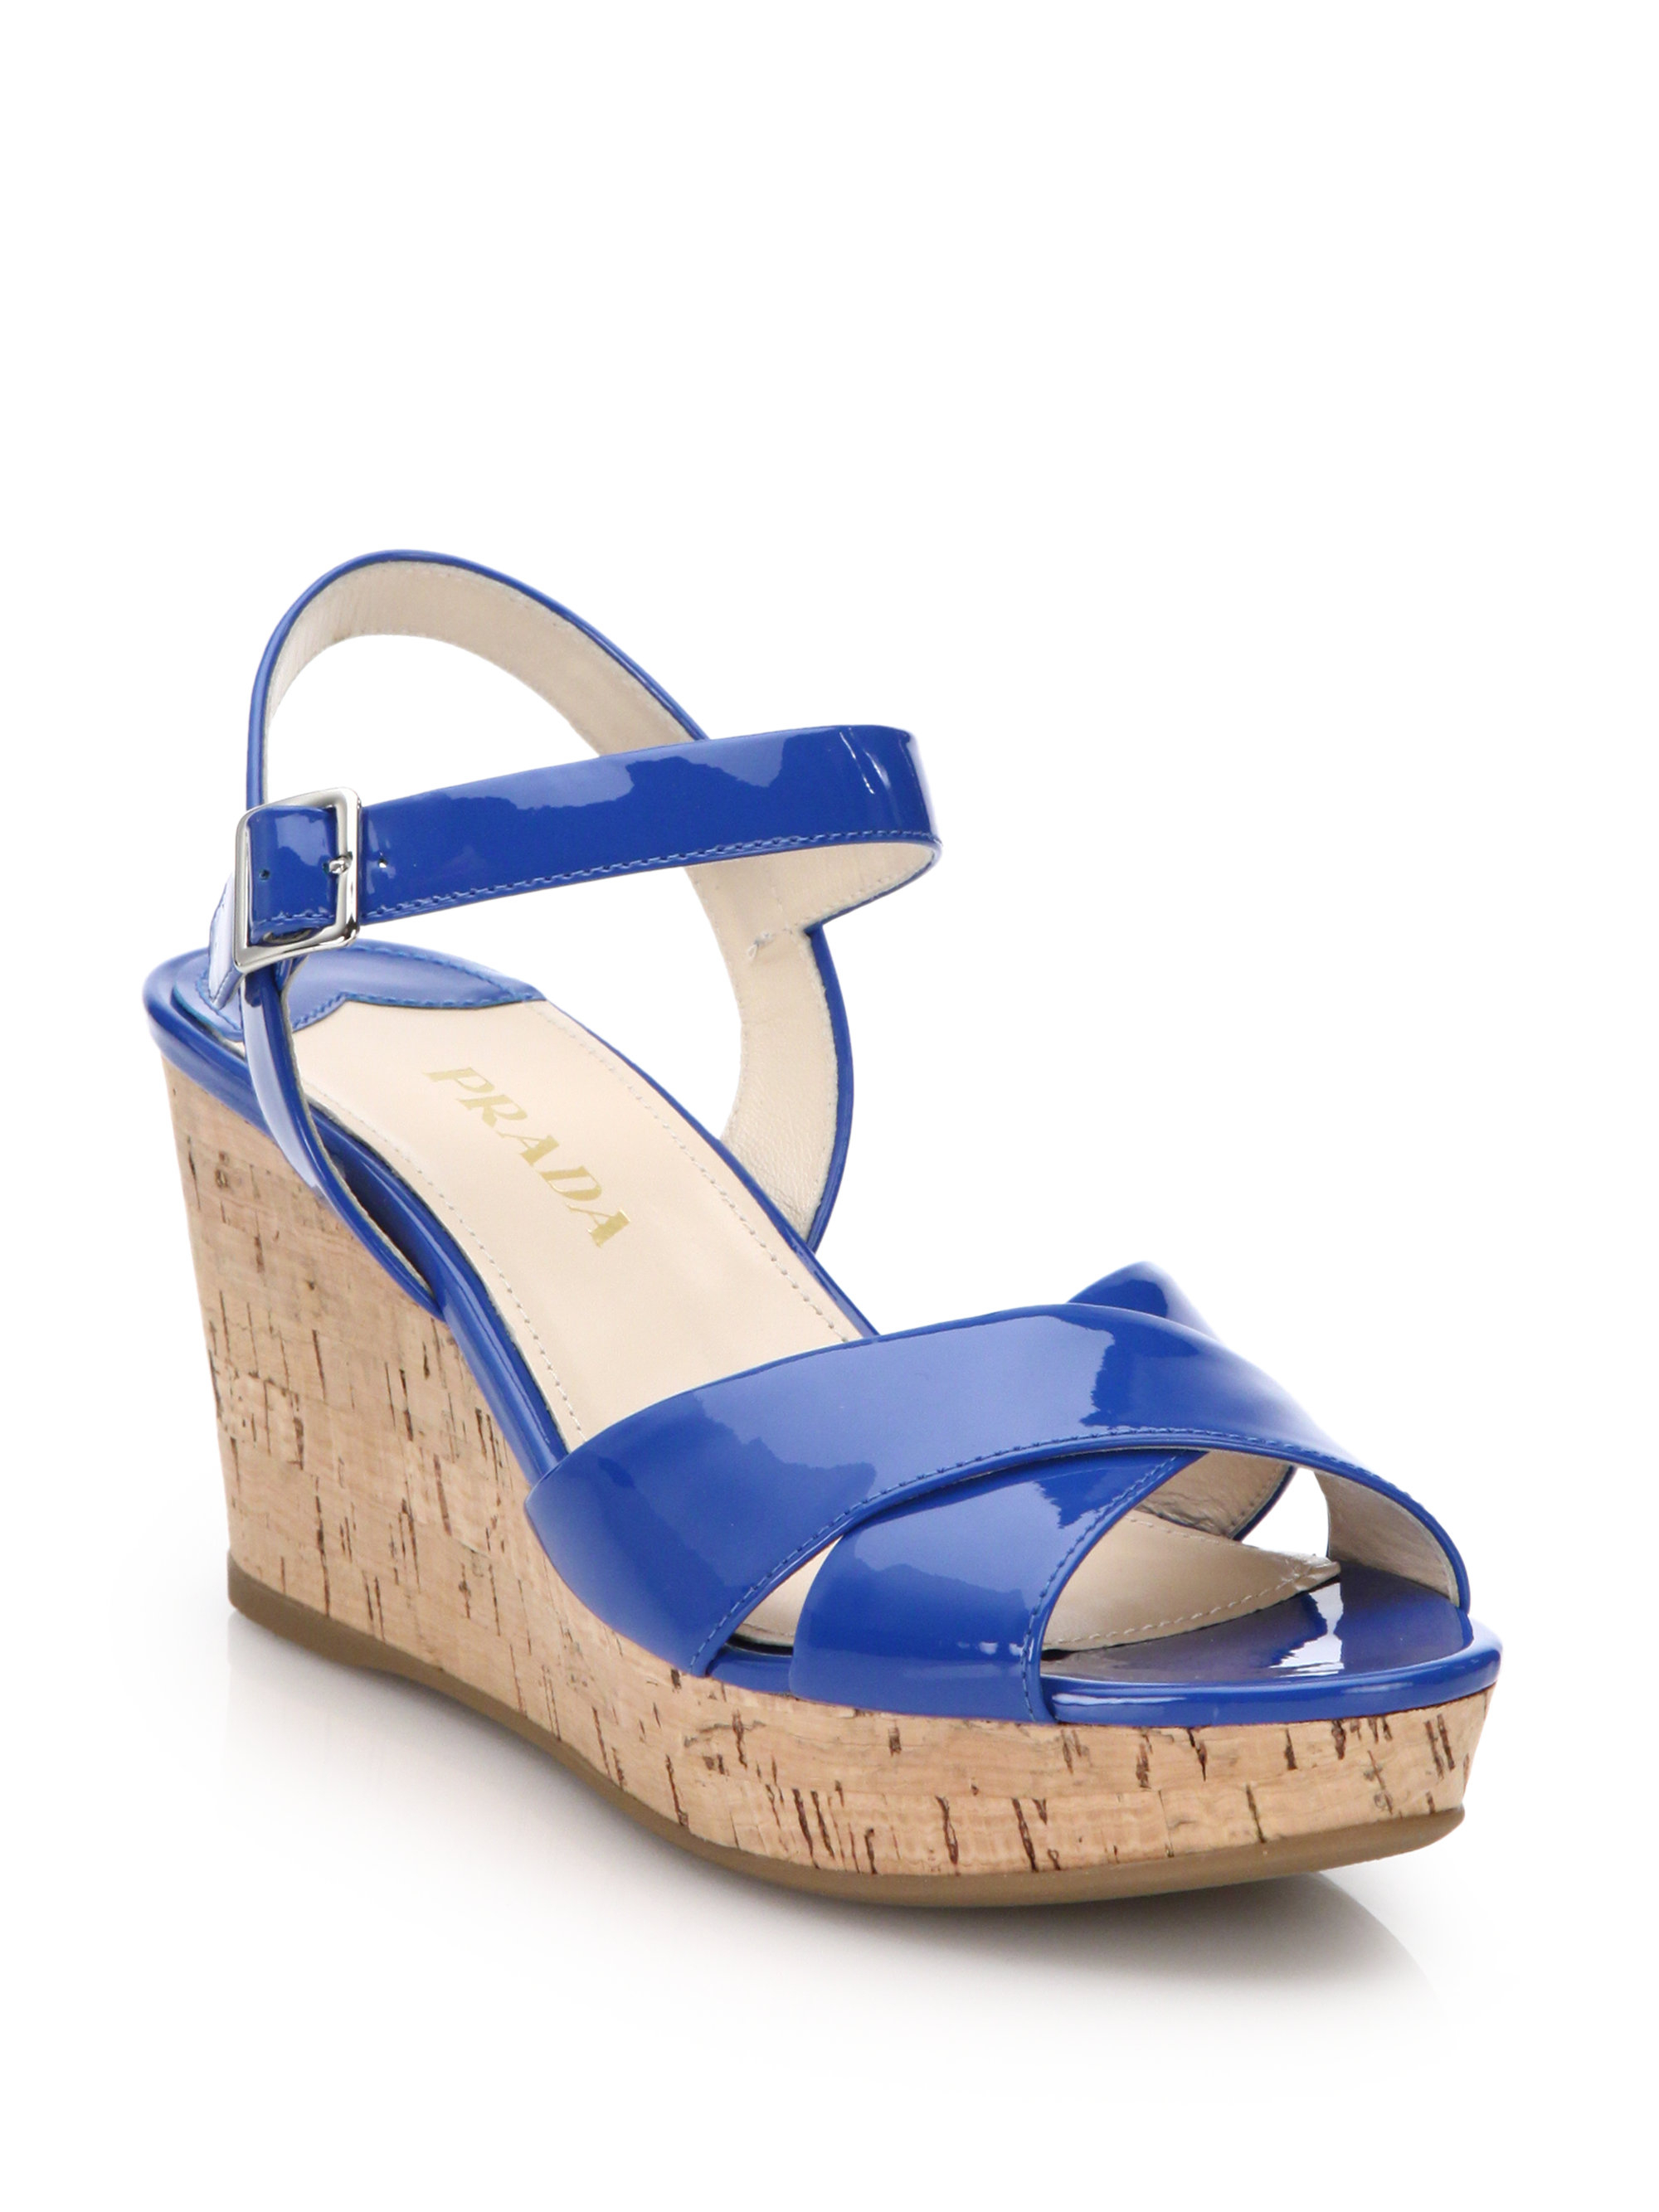 prada cork wedge patent leather sandals in blue lyst